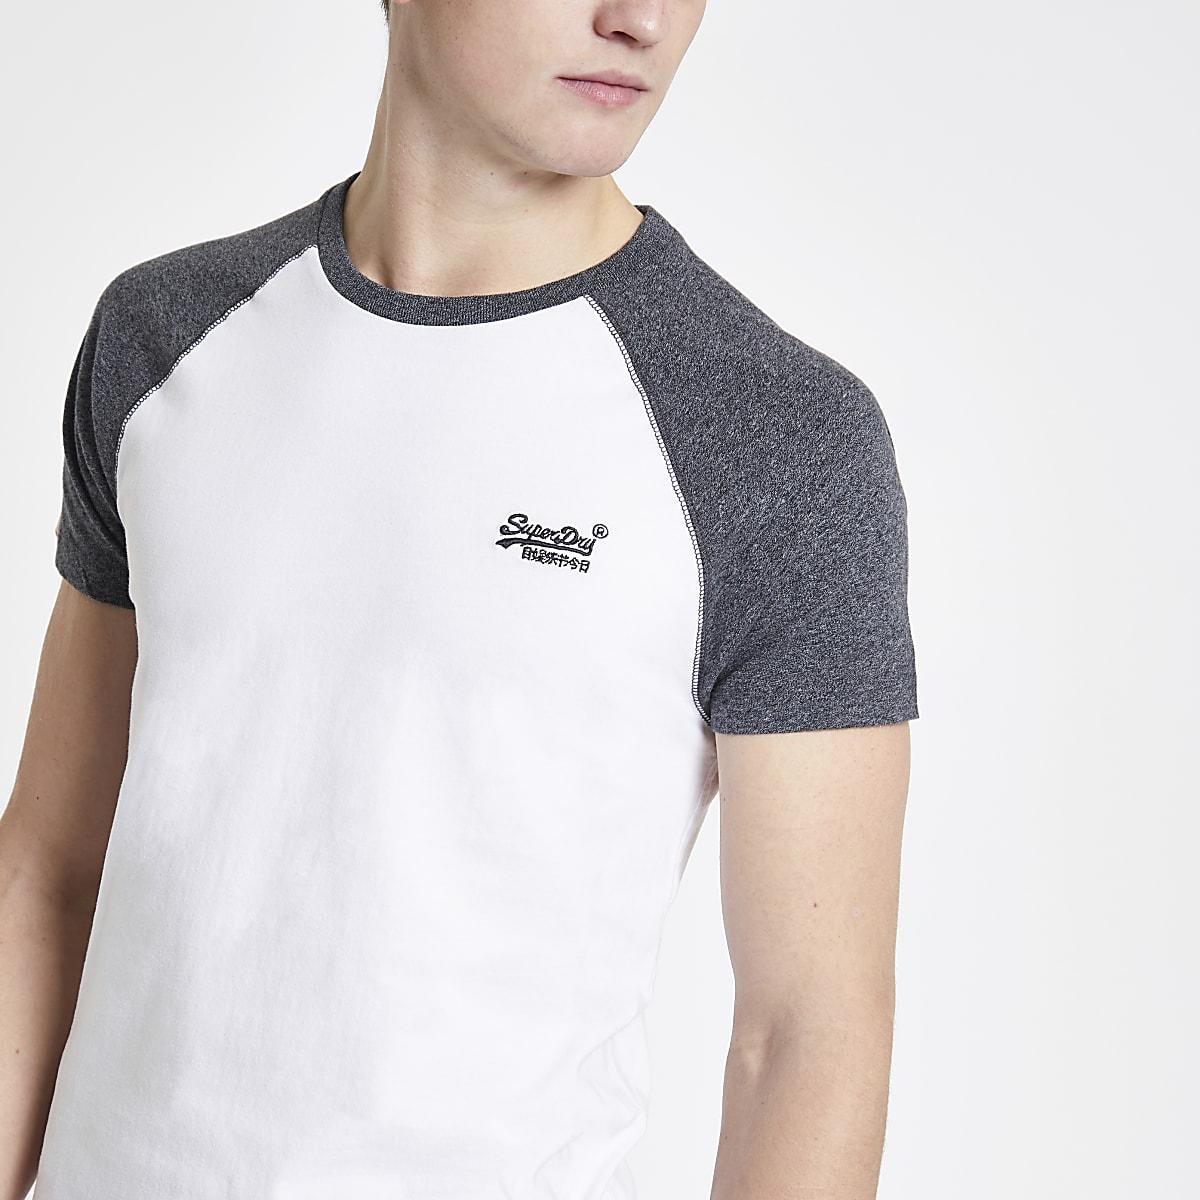 Superdry grey raglan T-shirt